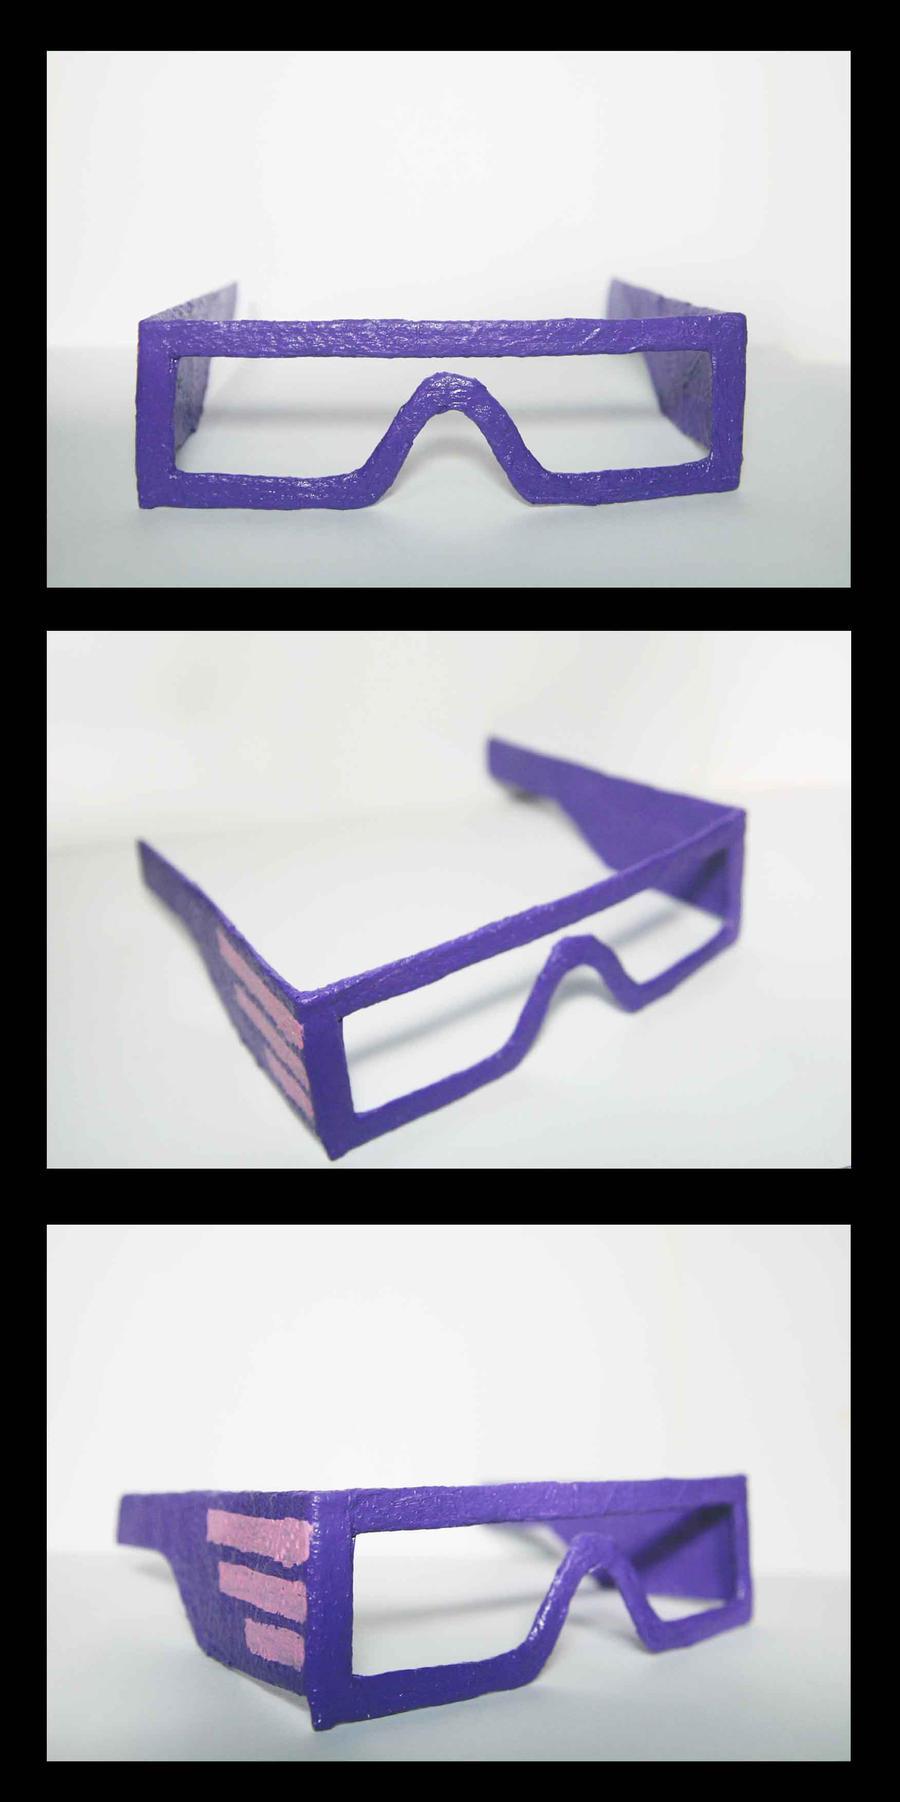 kacamata kertas by Swielly